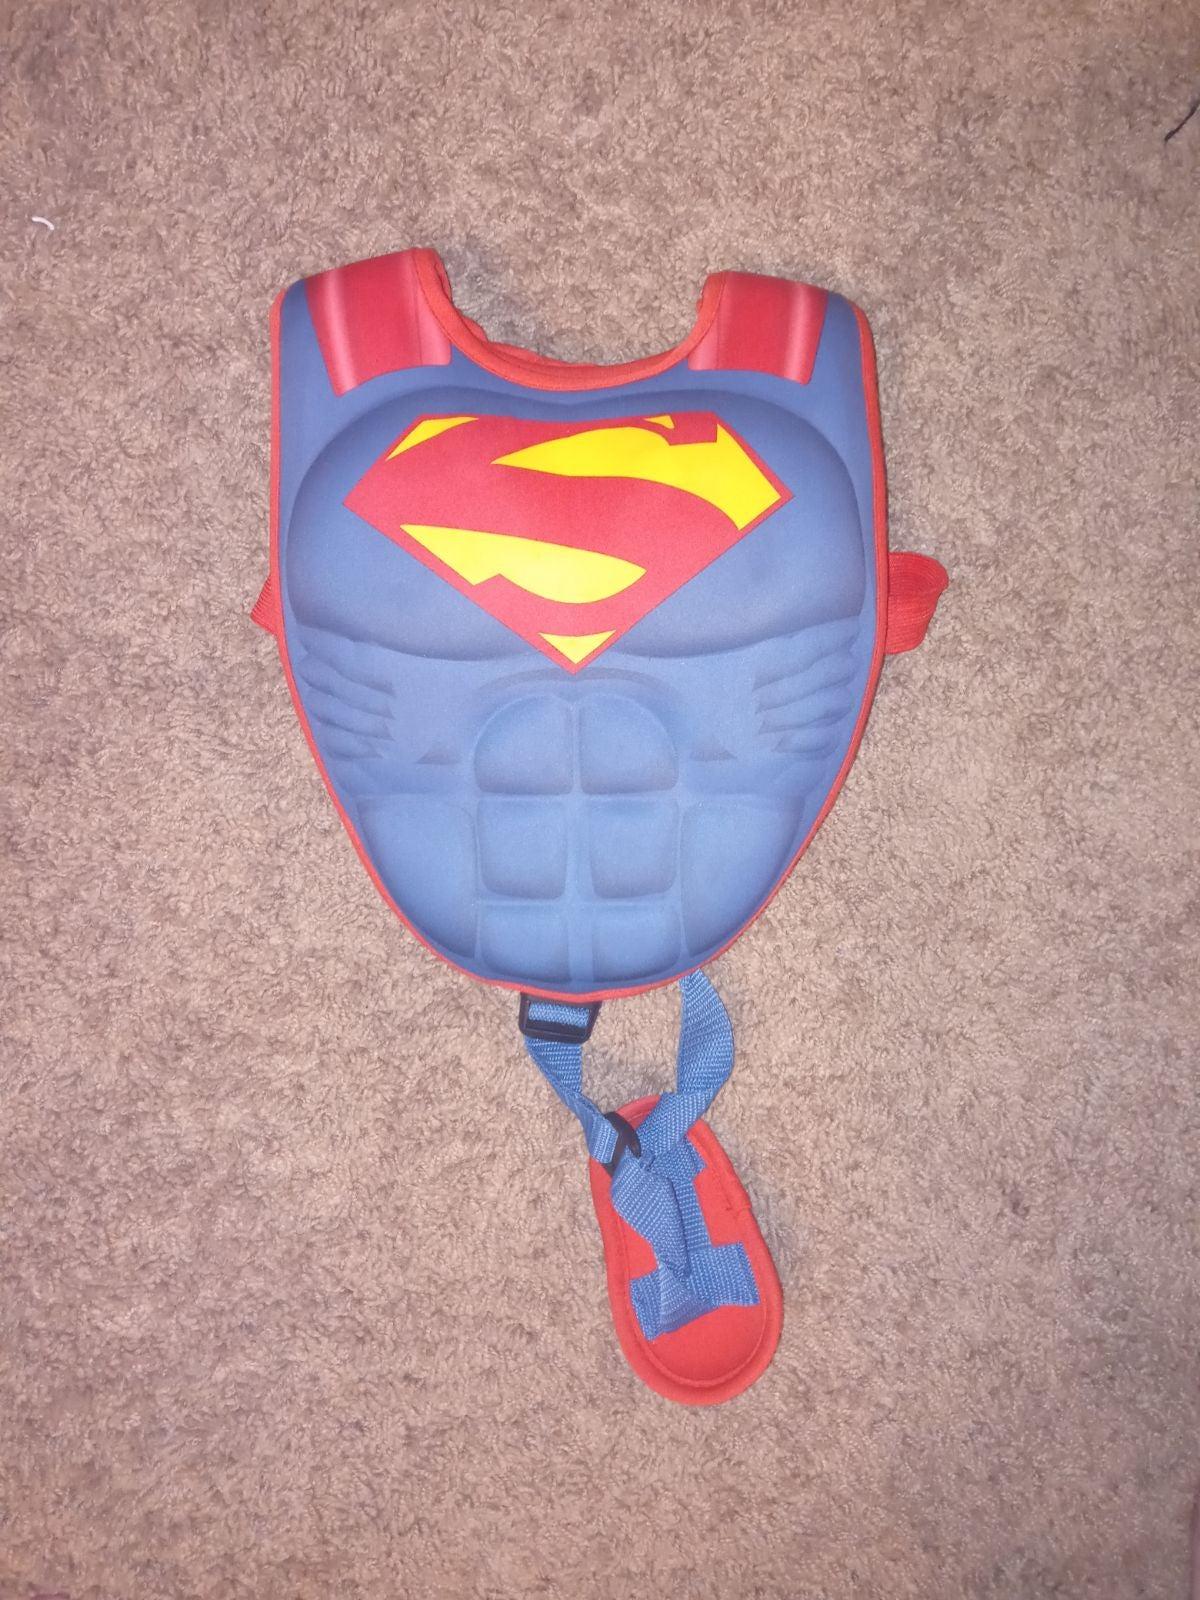 Superman infant life vest